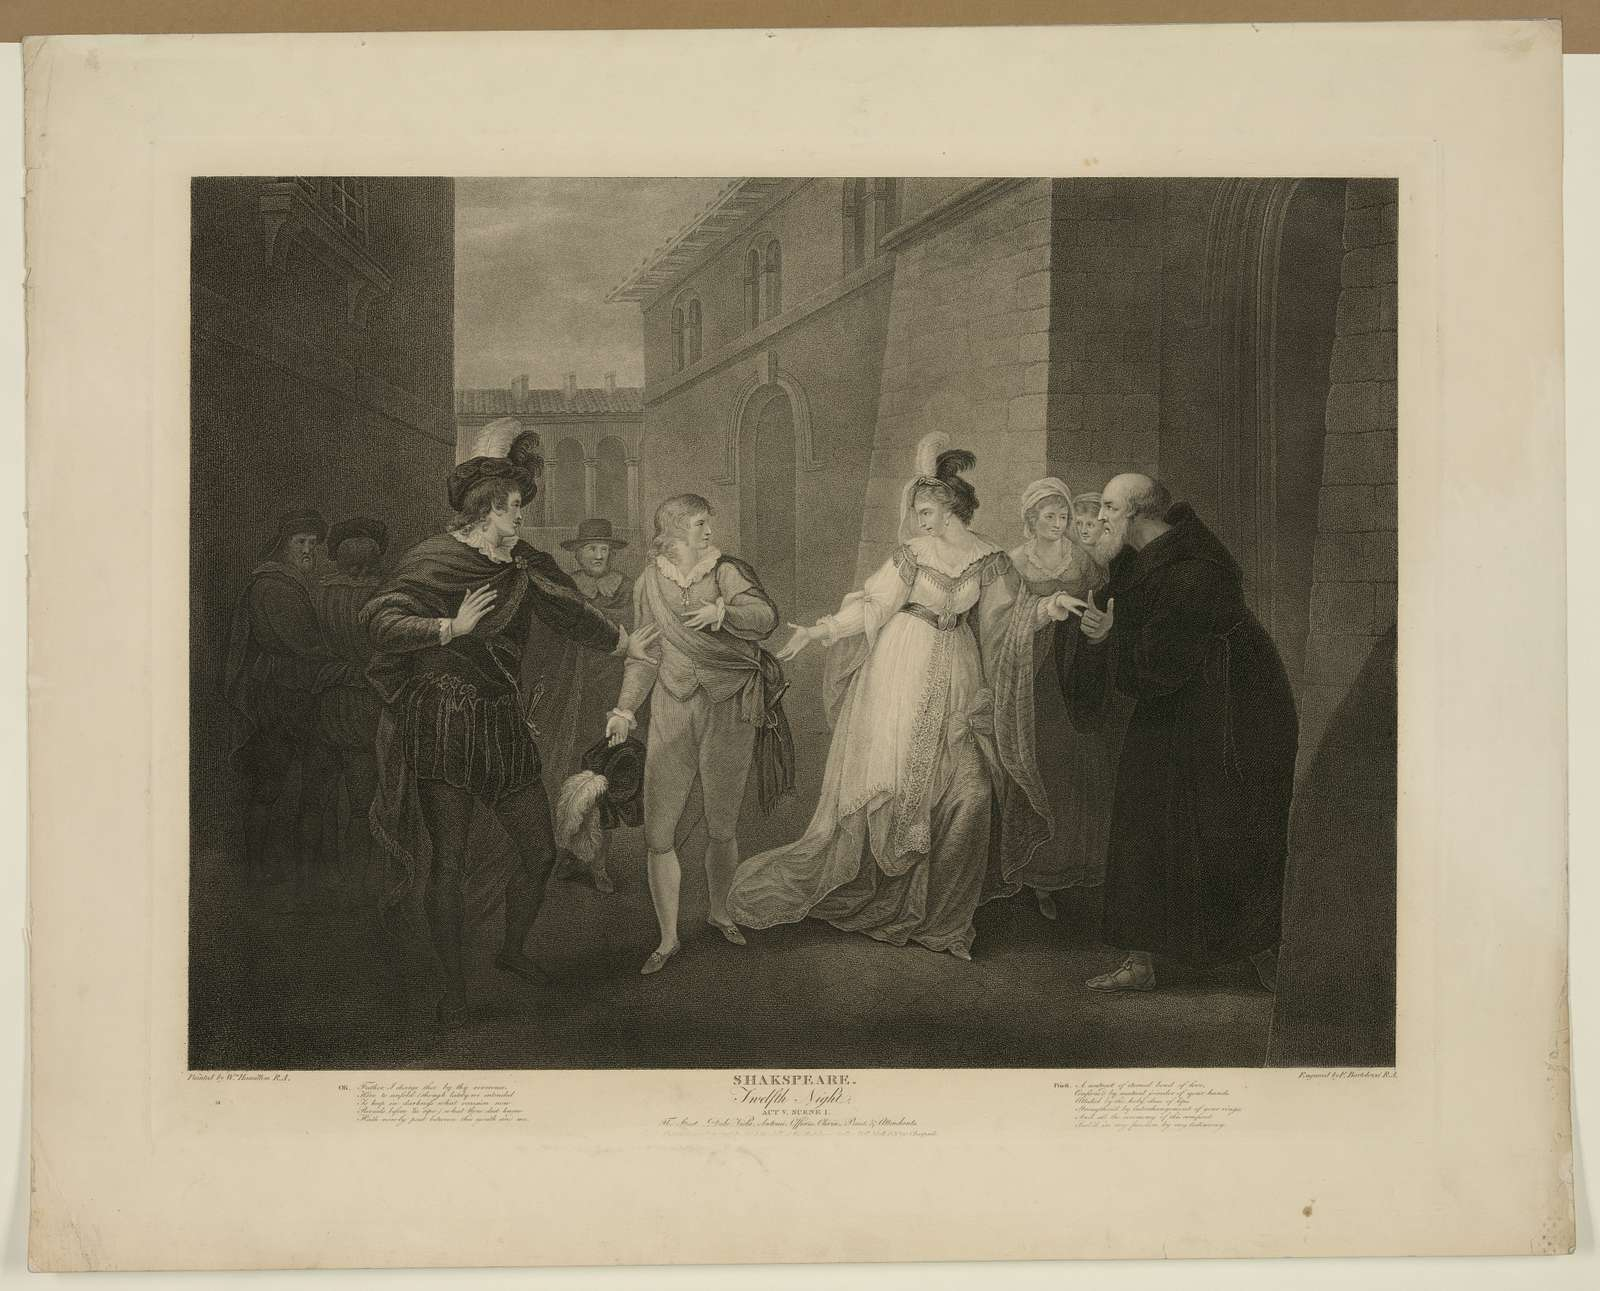 Shakespeare. Twelfth Night. Act V. Scene I